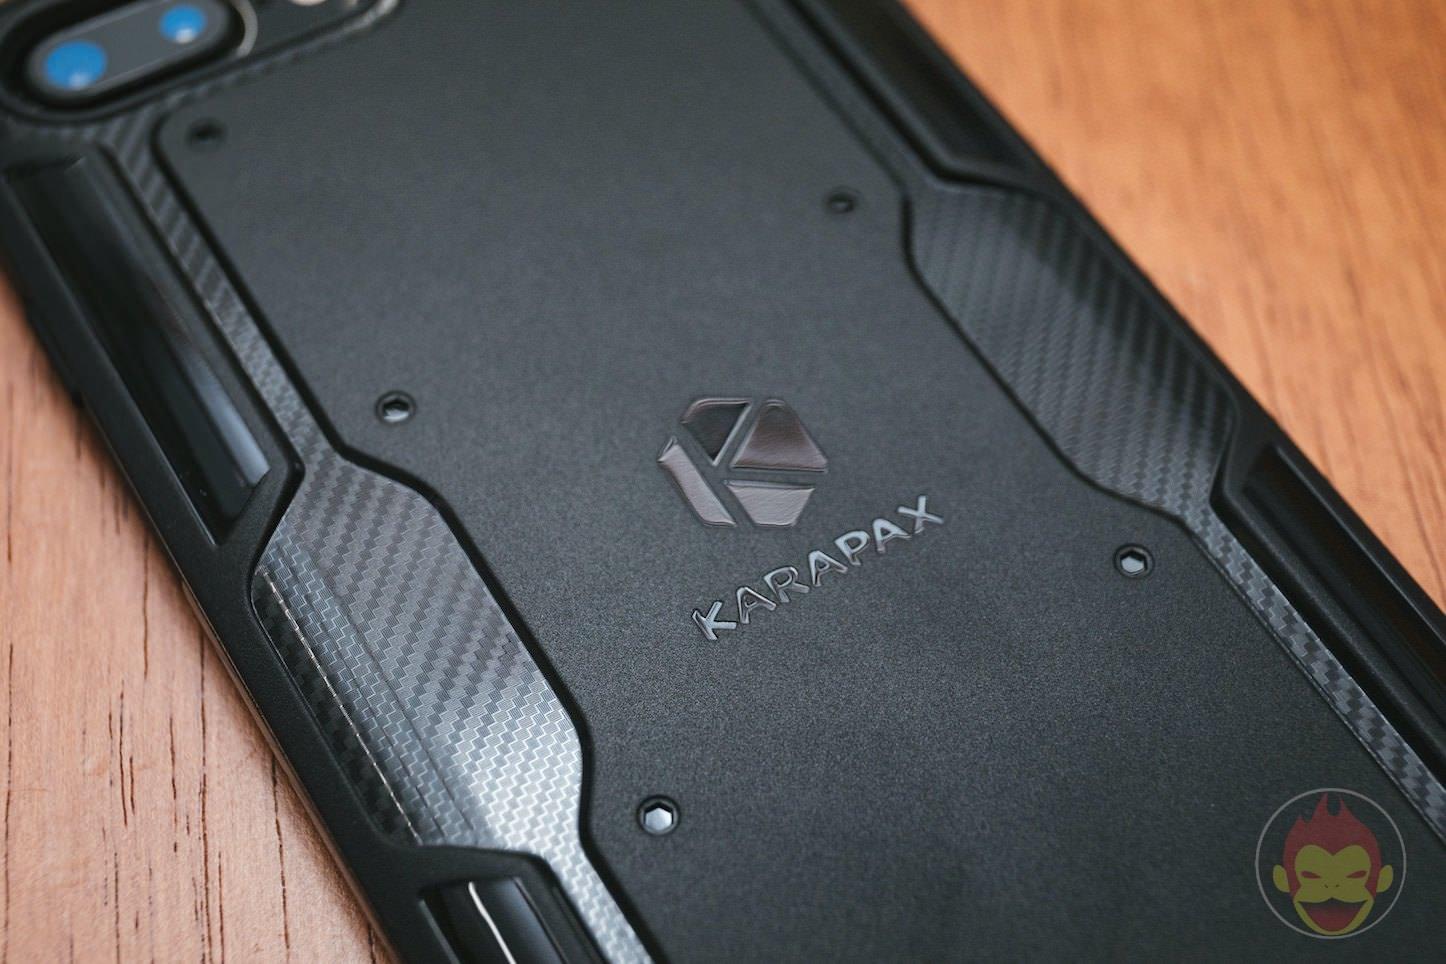 Anker-KARAPAX-Shield-for-iPhone8Plus-03.jpg